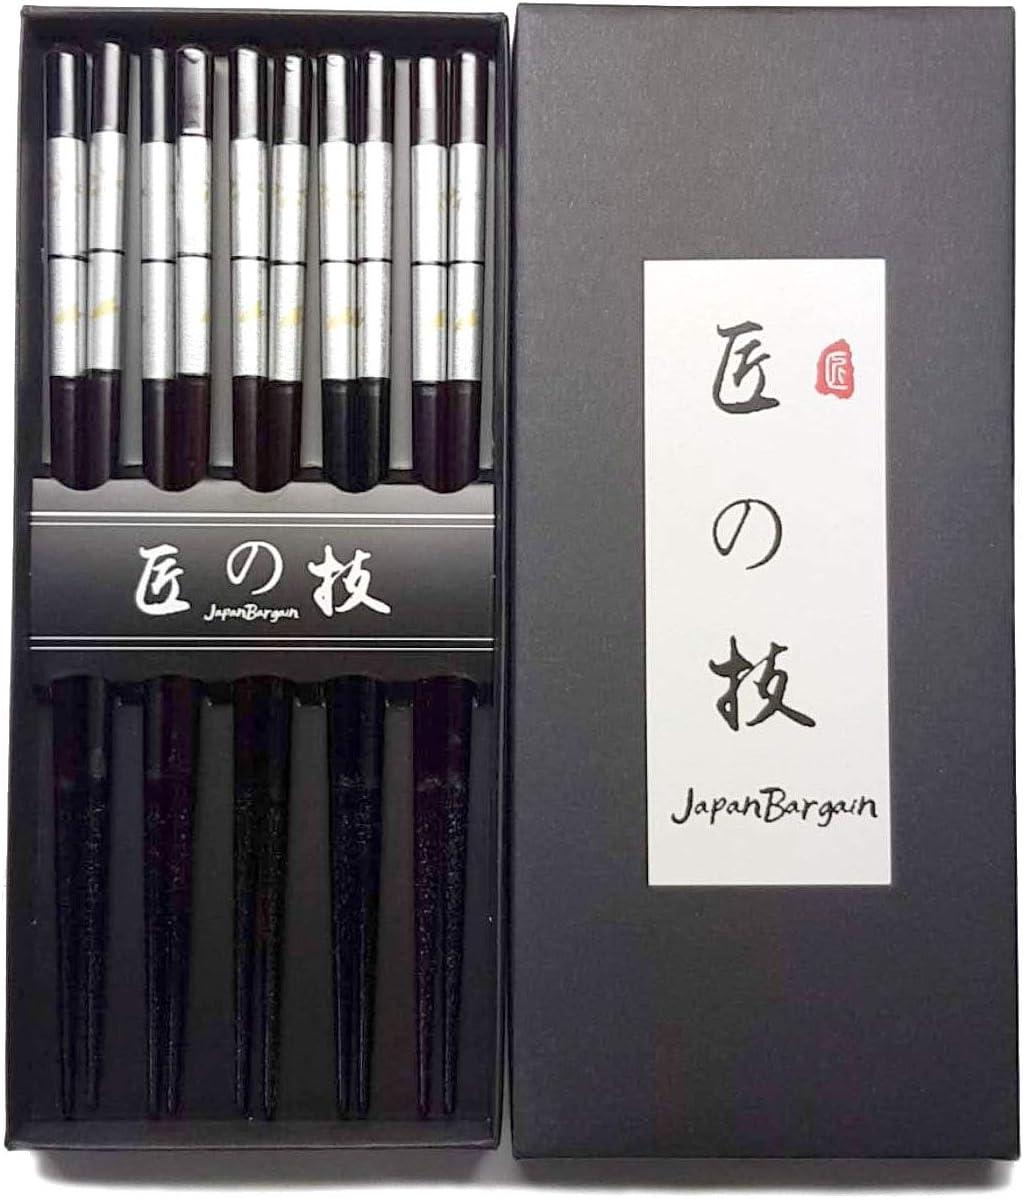 JapanBargain 4508, Bamboo Chopsticks Reusable Japanese Chinese Korean Wood Chop Sticks Hair Sticks 5 Pair Gift Boxed Set Dishwasher Safe, 9 inch, Brown, Sakura Cherry Blossom